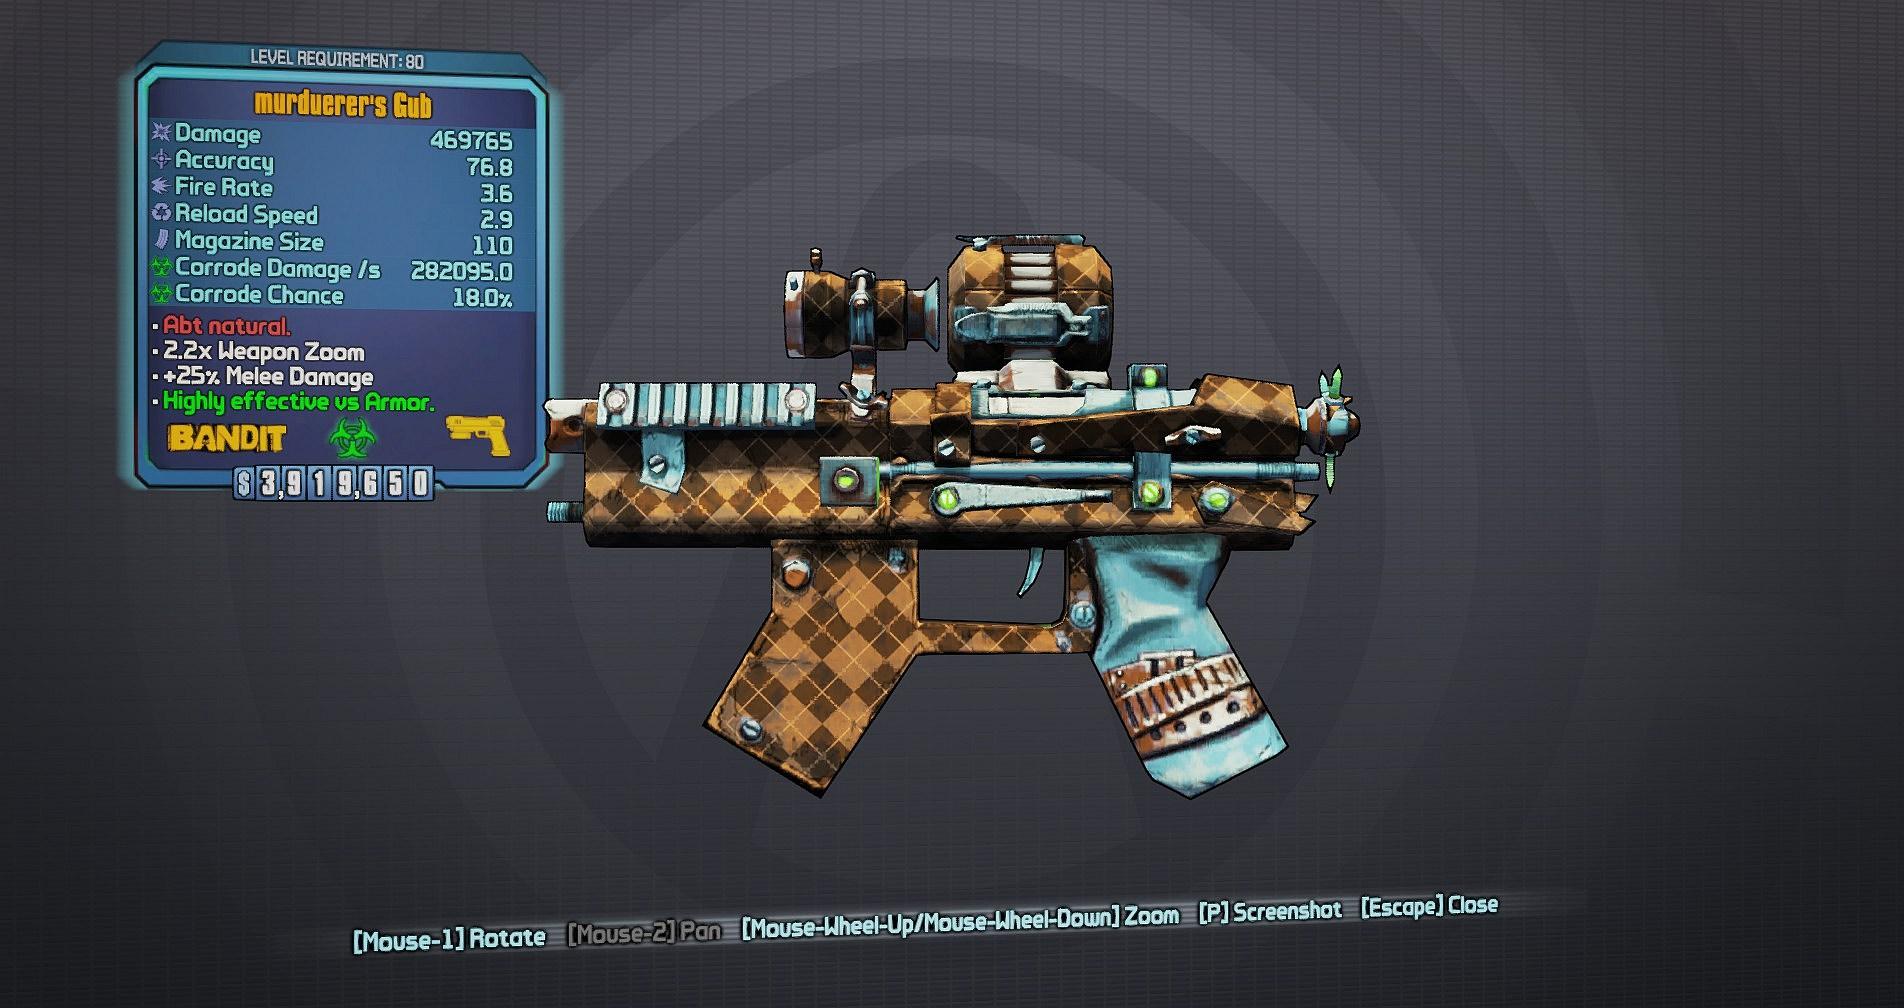 Gub legendary weapon playborderlands